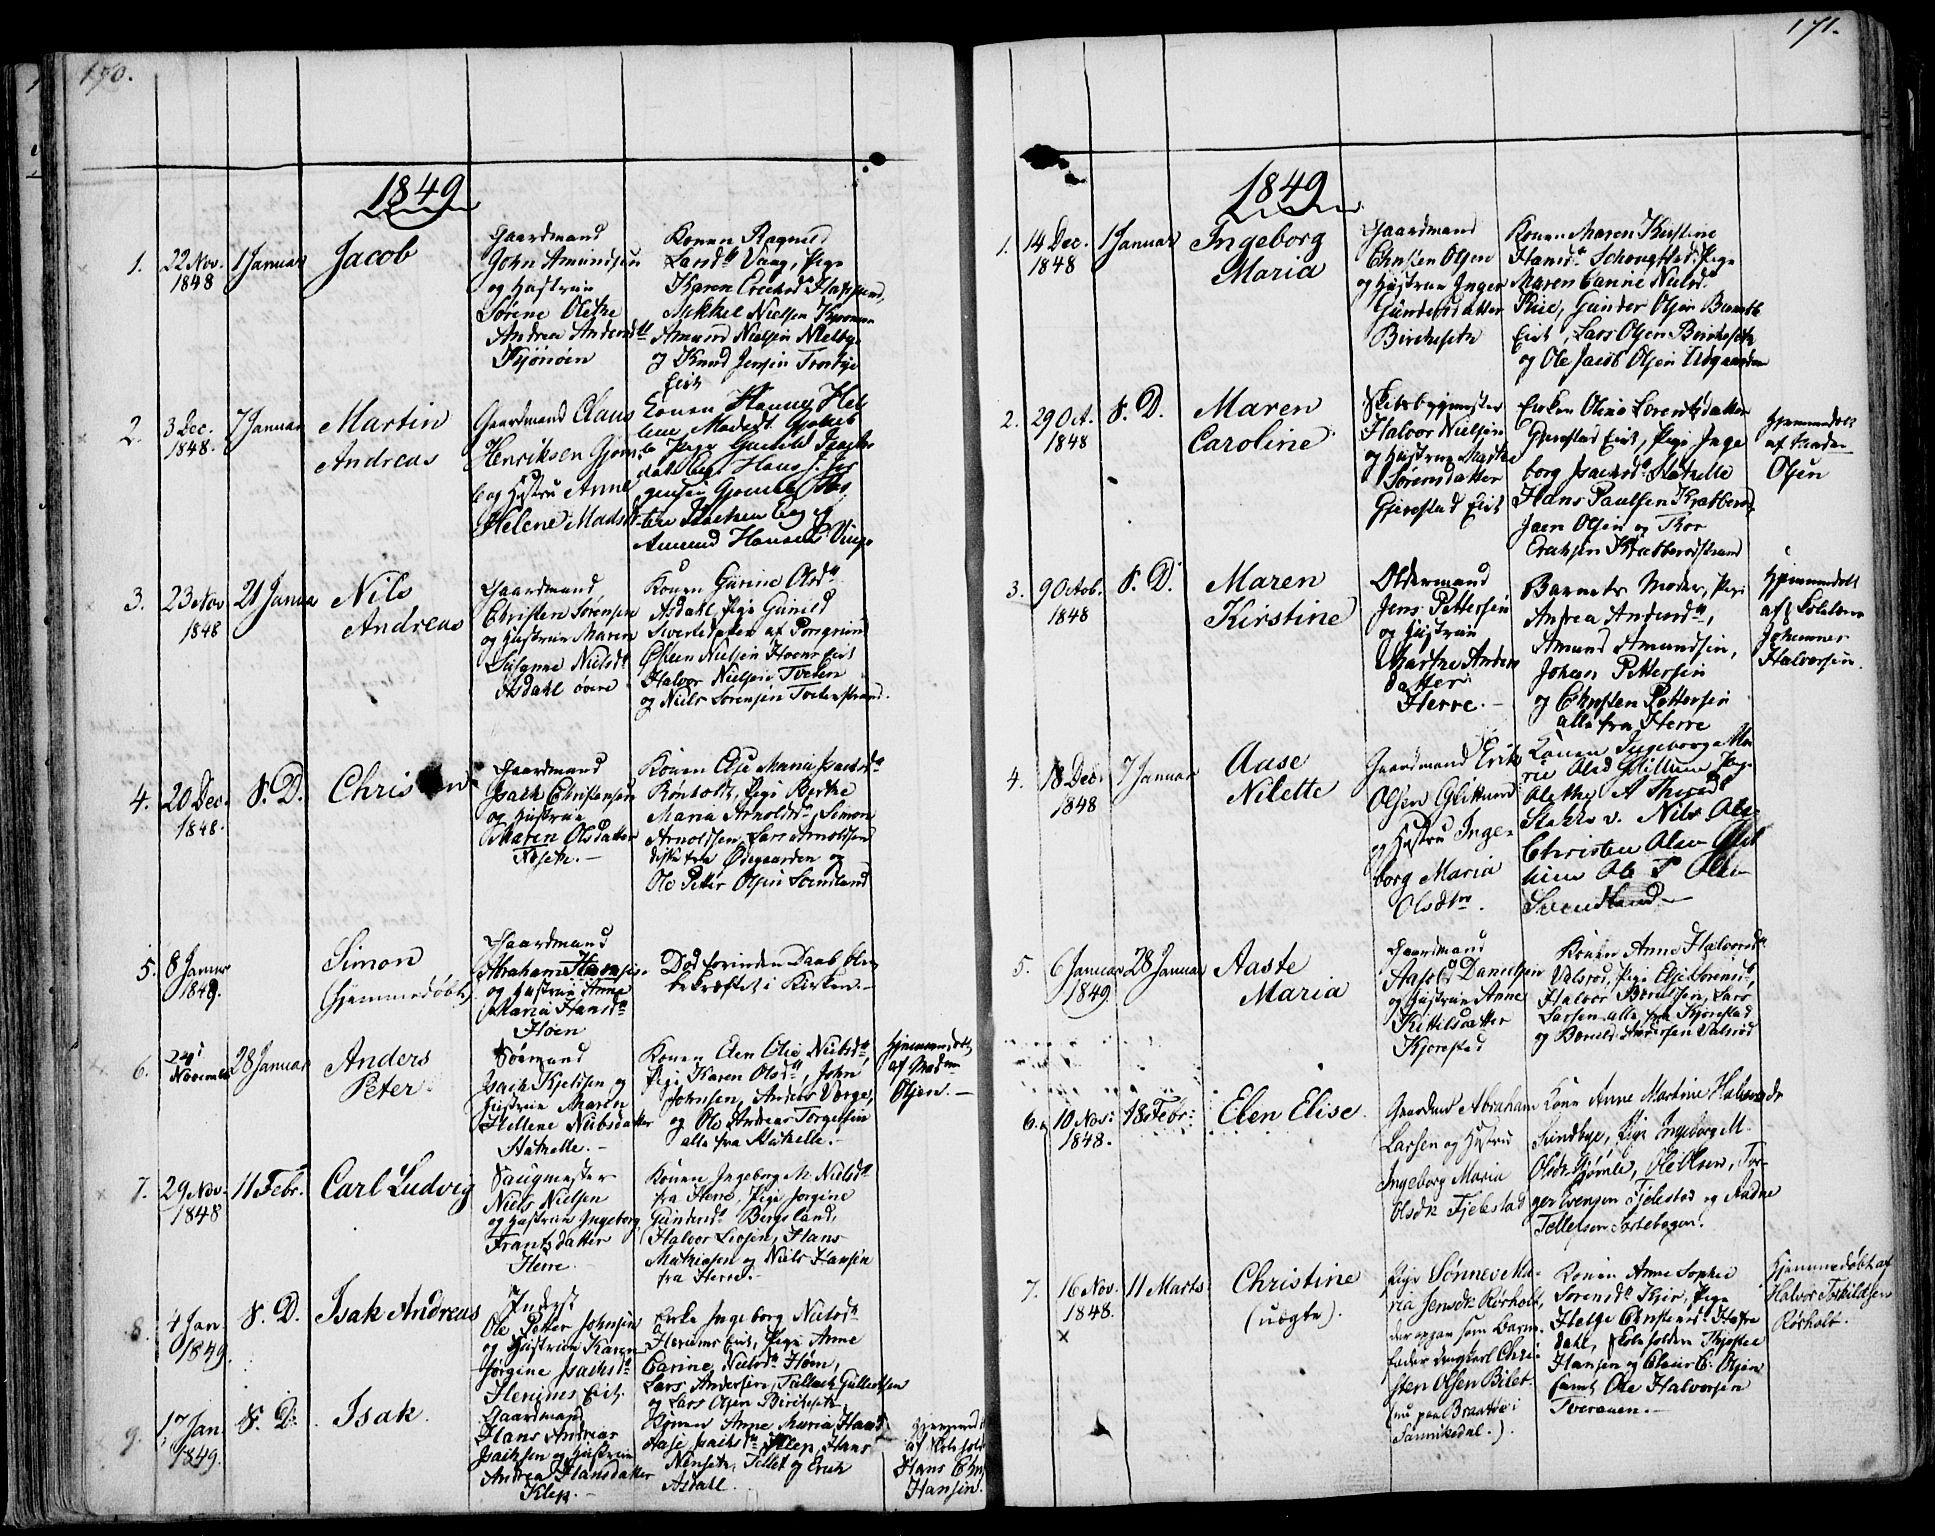 SAKO, Bamble kirkebøker, F/Fa/L0004: Ministerialbok nr. I 4, 1834-1853, s. 170-171